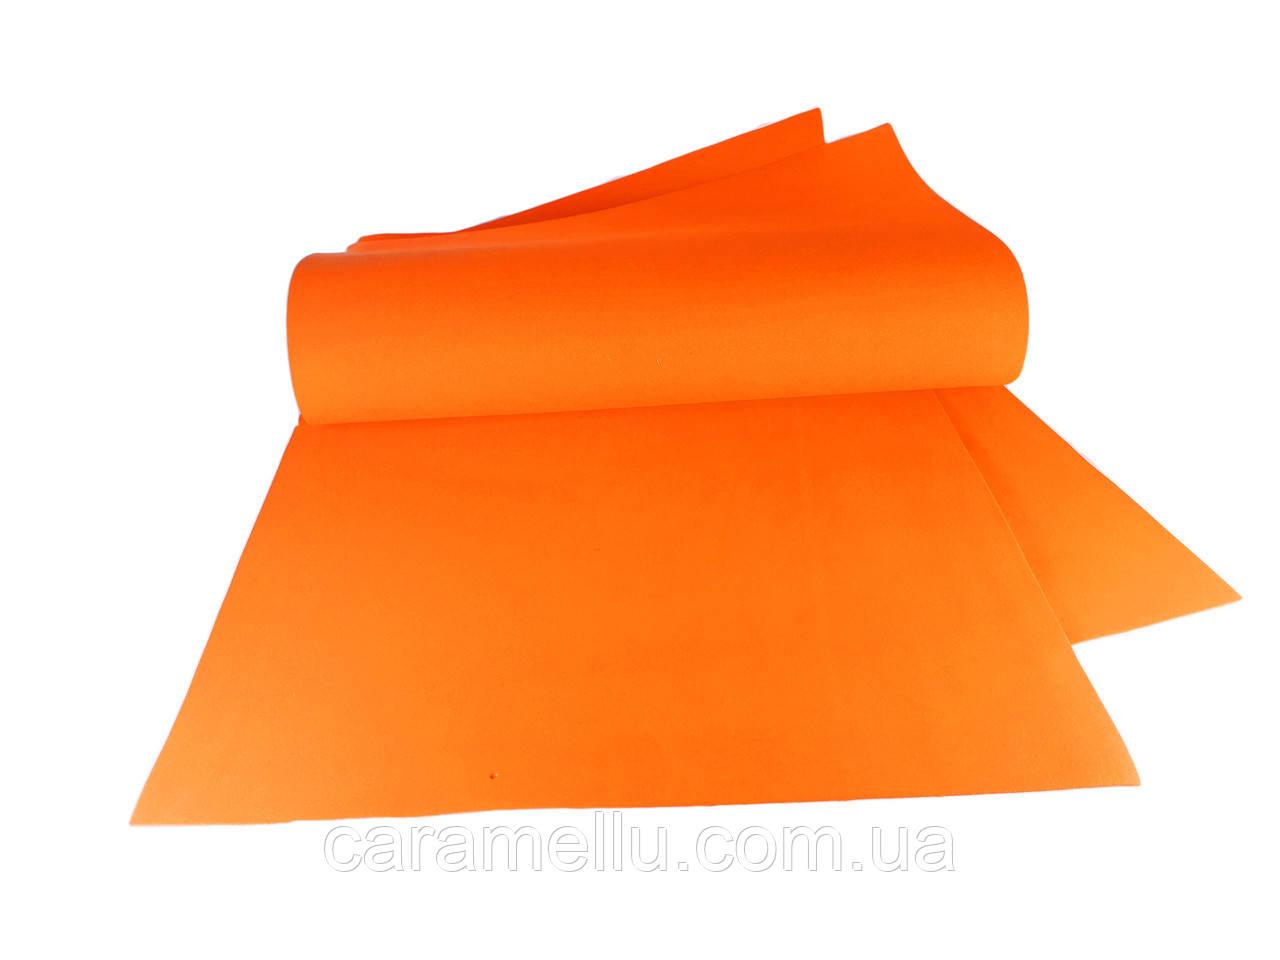 Фоамиран иранский 125, Оранжевый, 1мм, 70х30см.